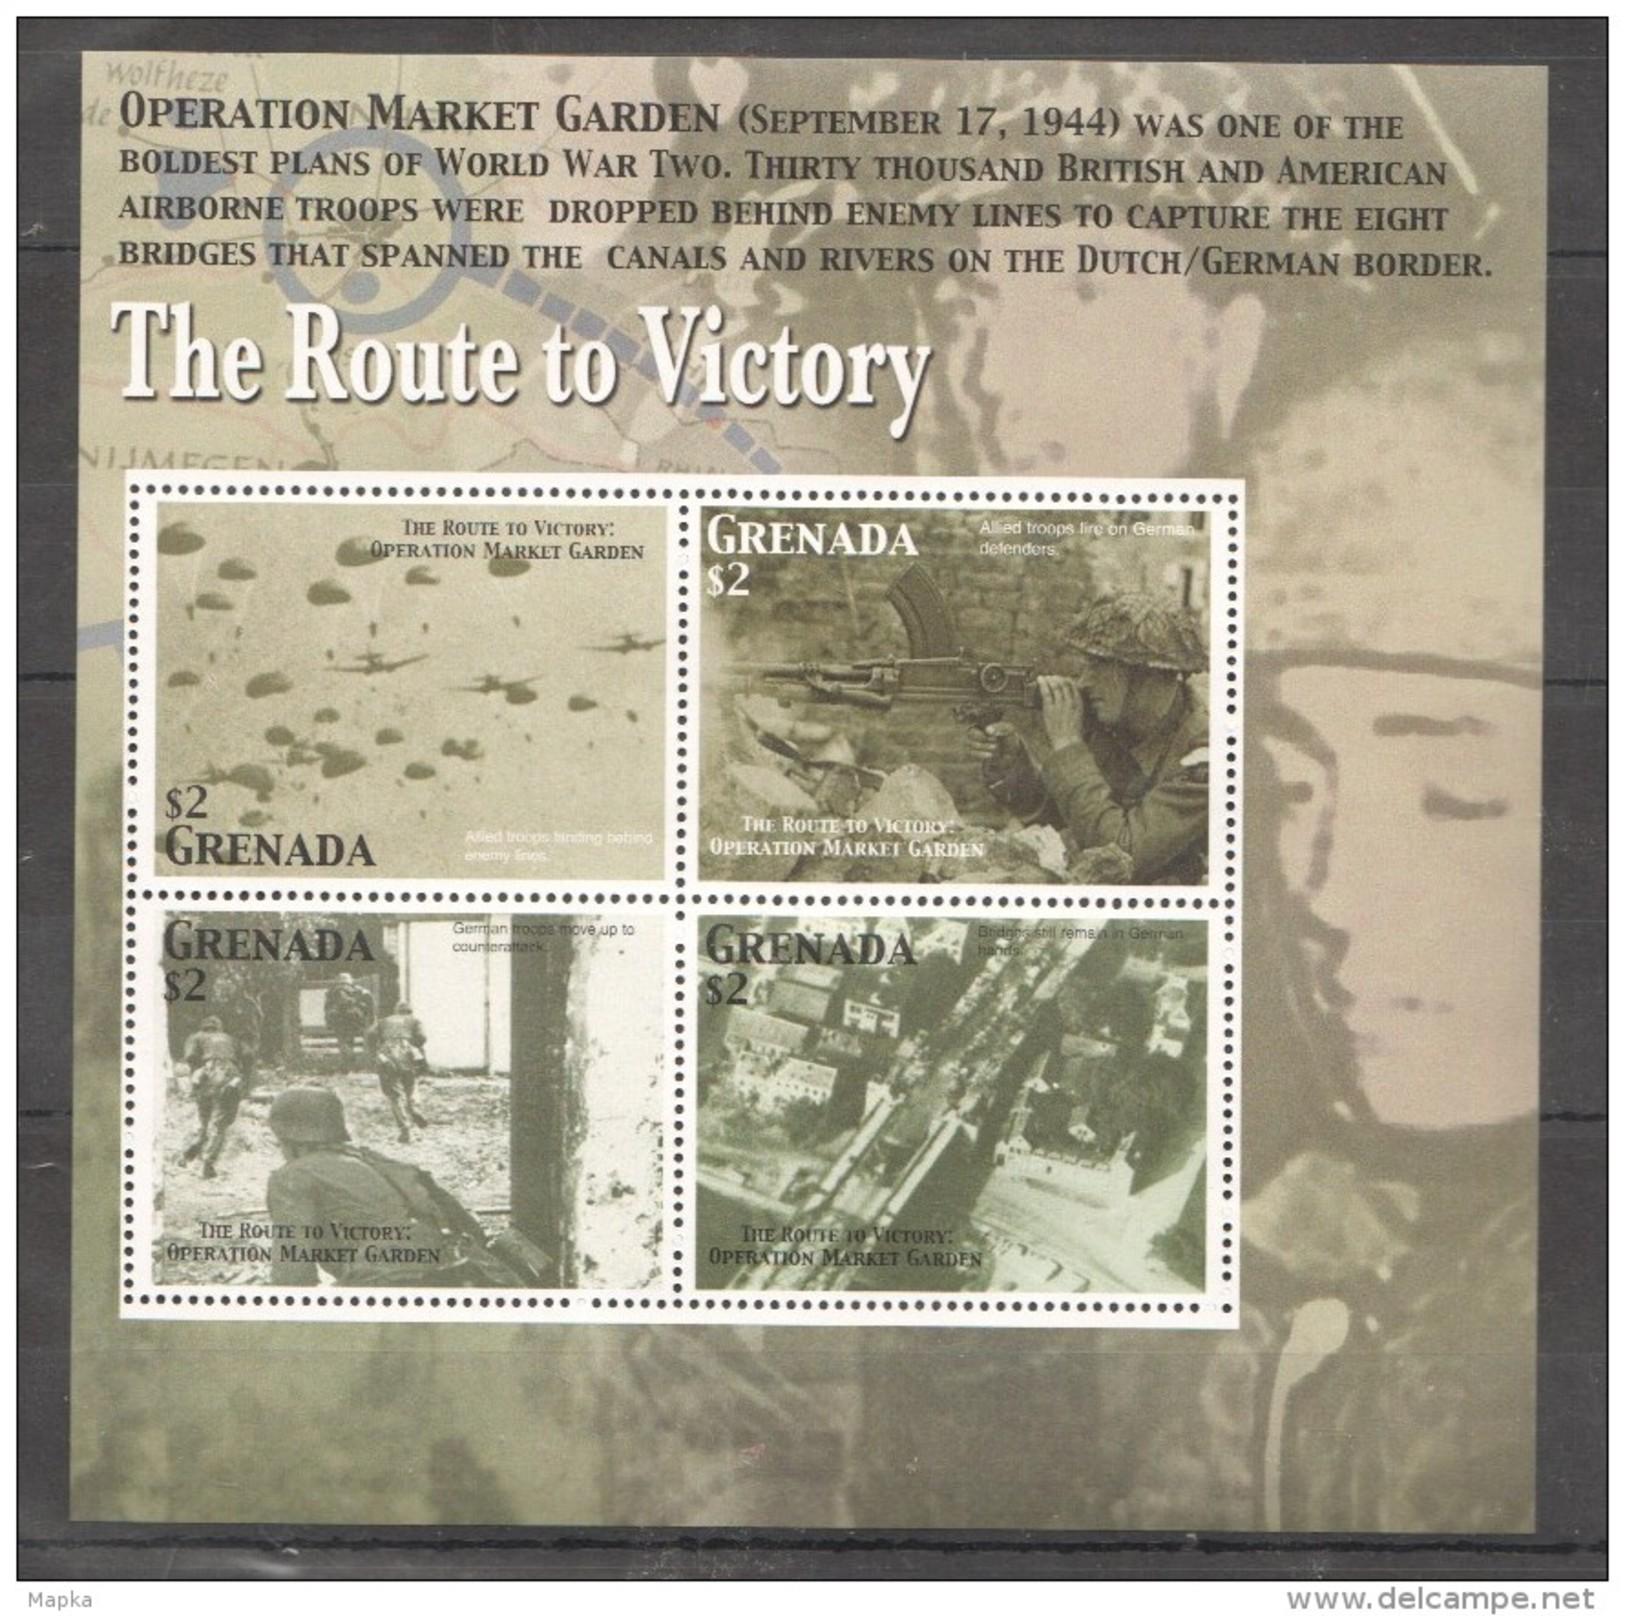 L672 GRENADA WW2 ROUTE TO VICTORY OPERATION MARKET GARDEN MNH - 2. Weltkrieg